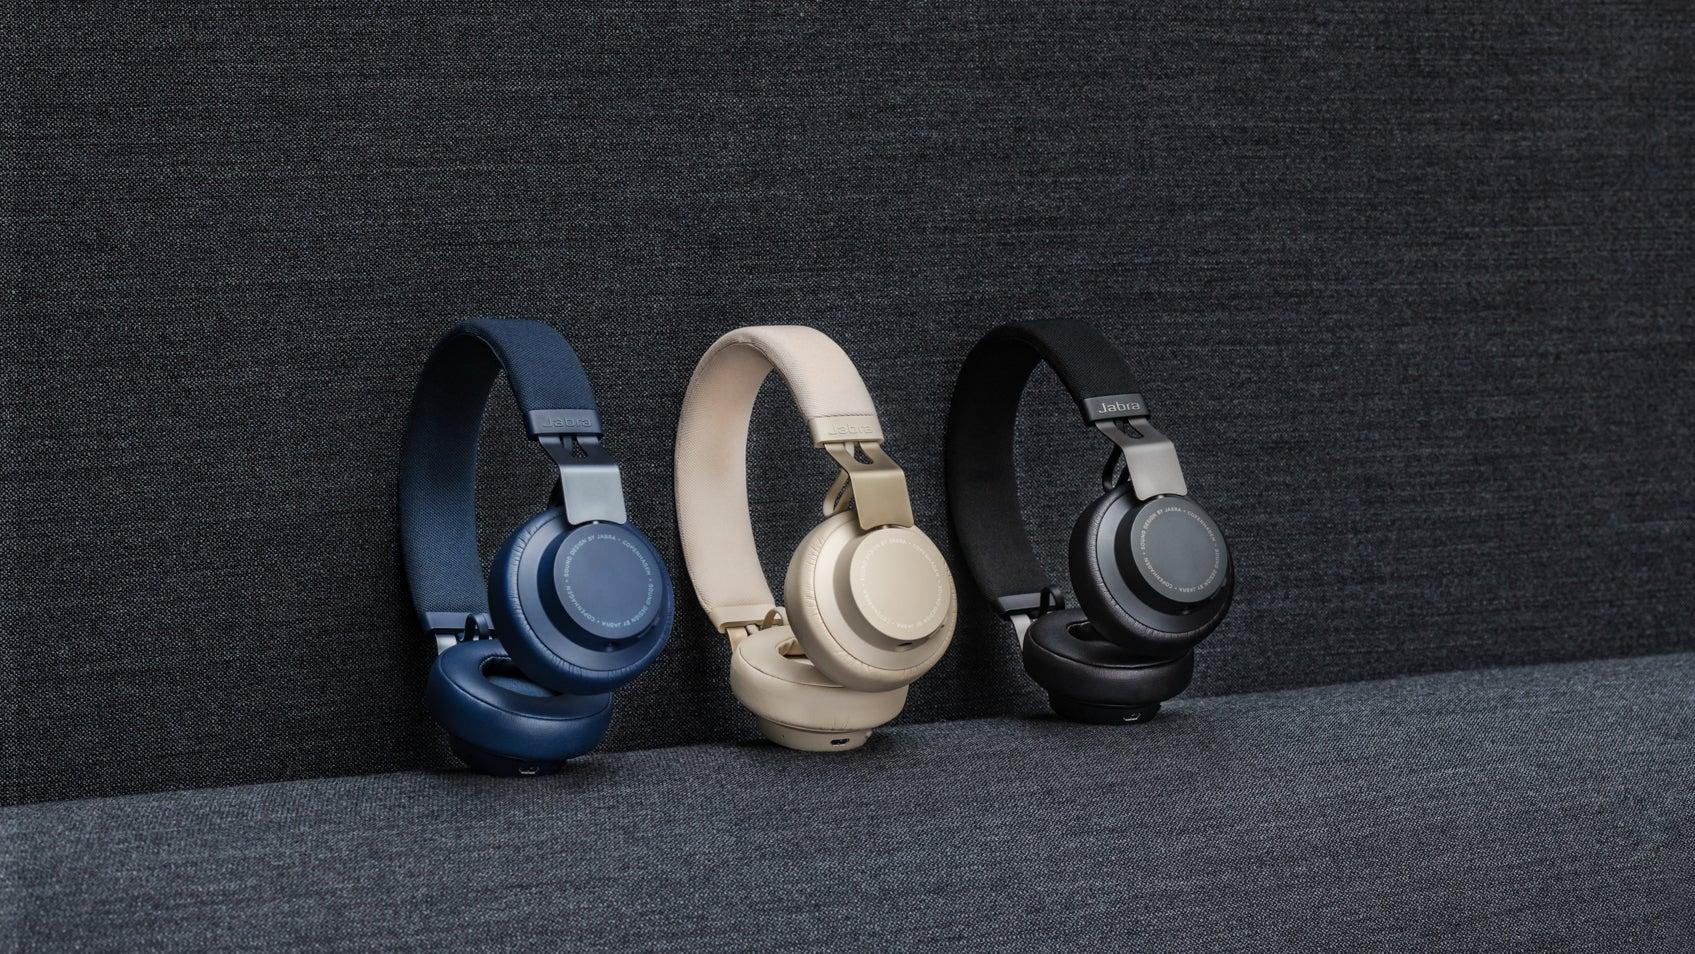 Jabra's Beautiful New Headphones Cancel Noise With AI